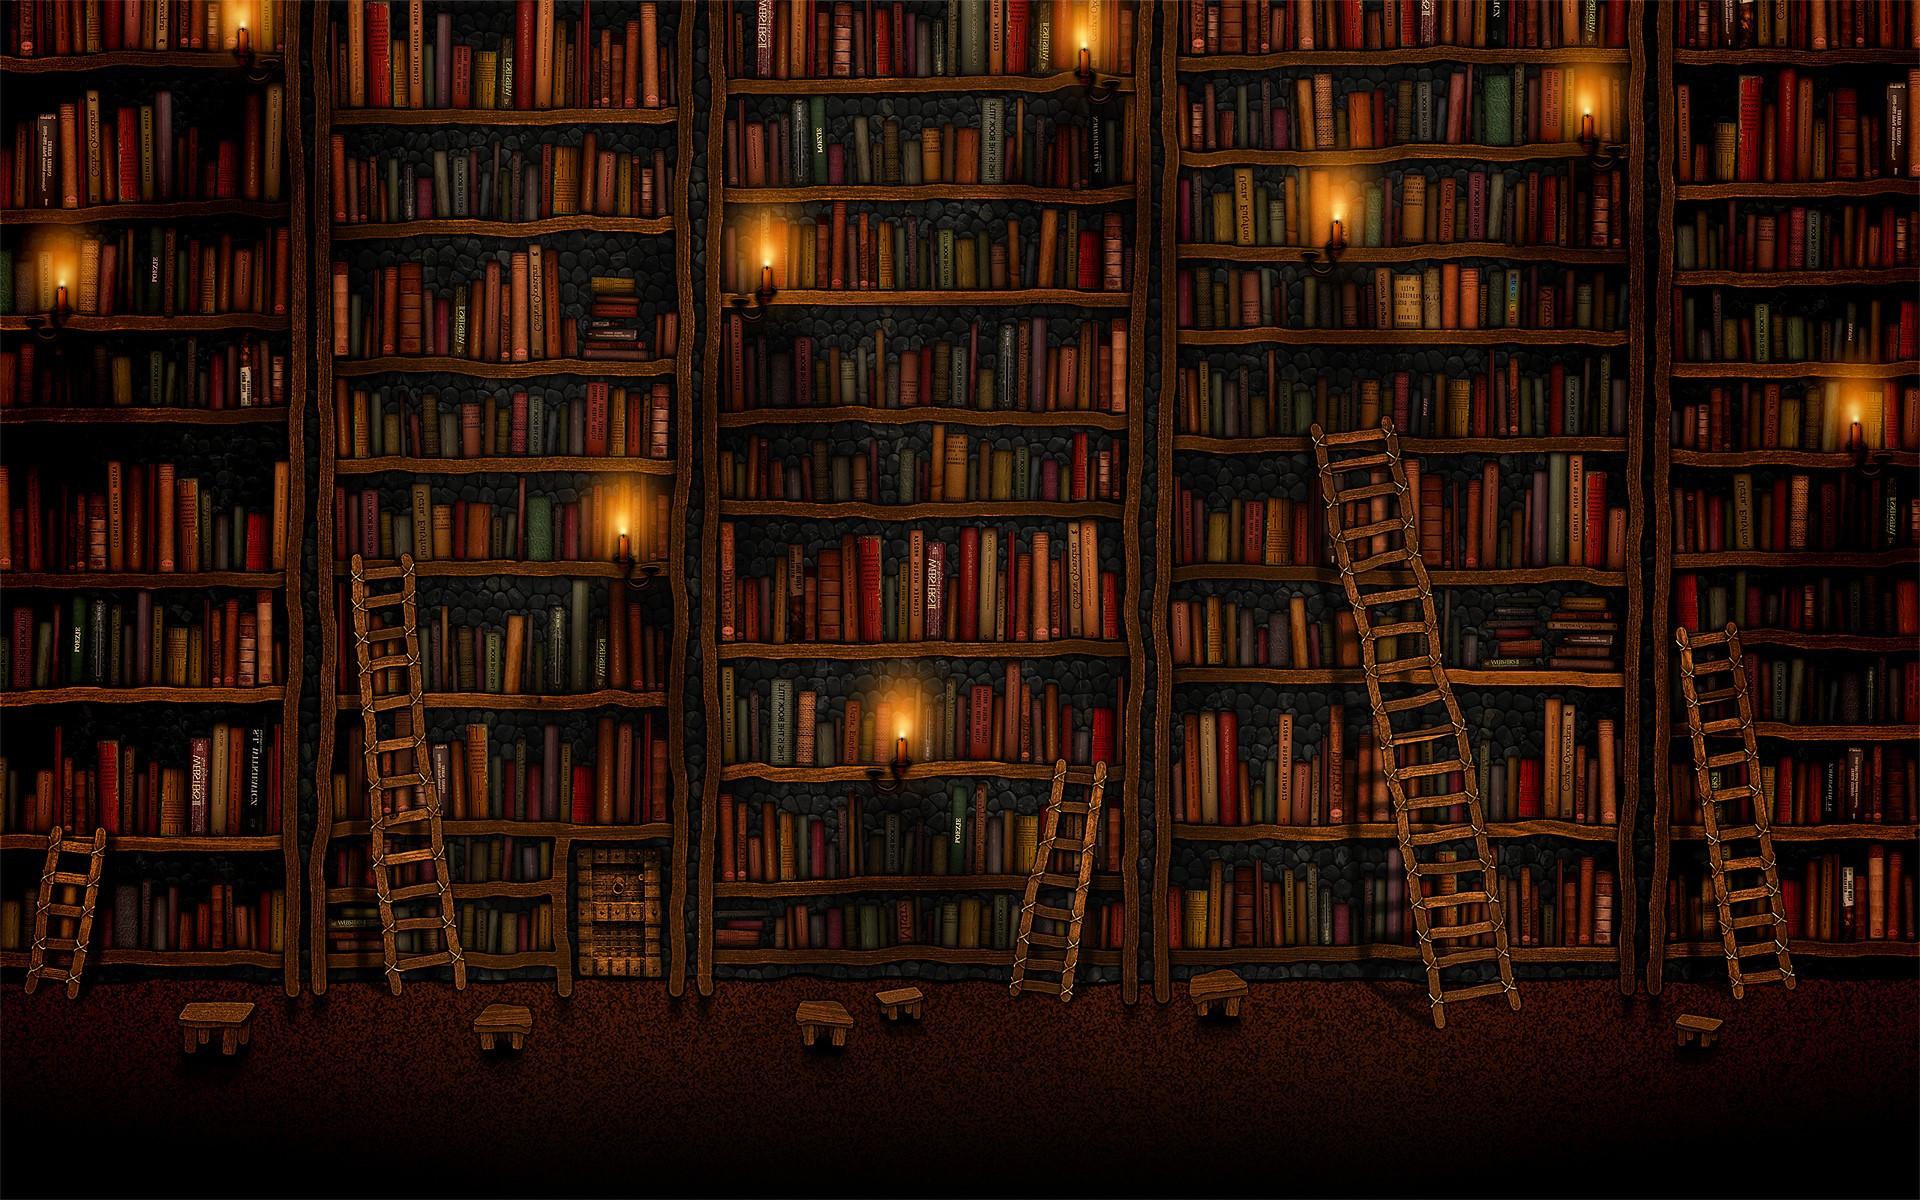 Tall bookshelves wallpaper 4672 1920x1200